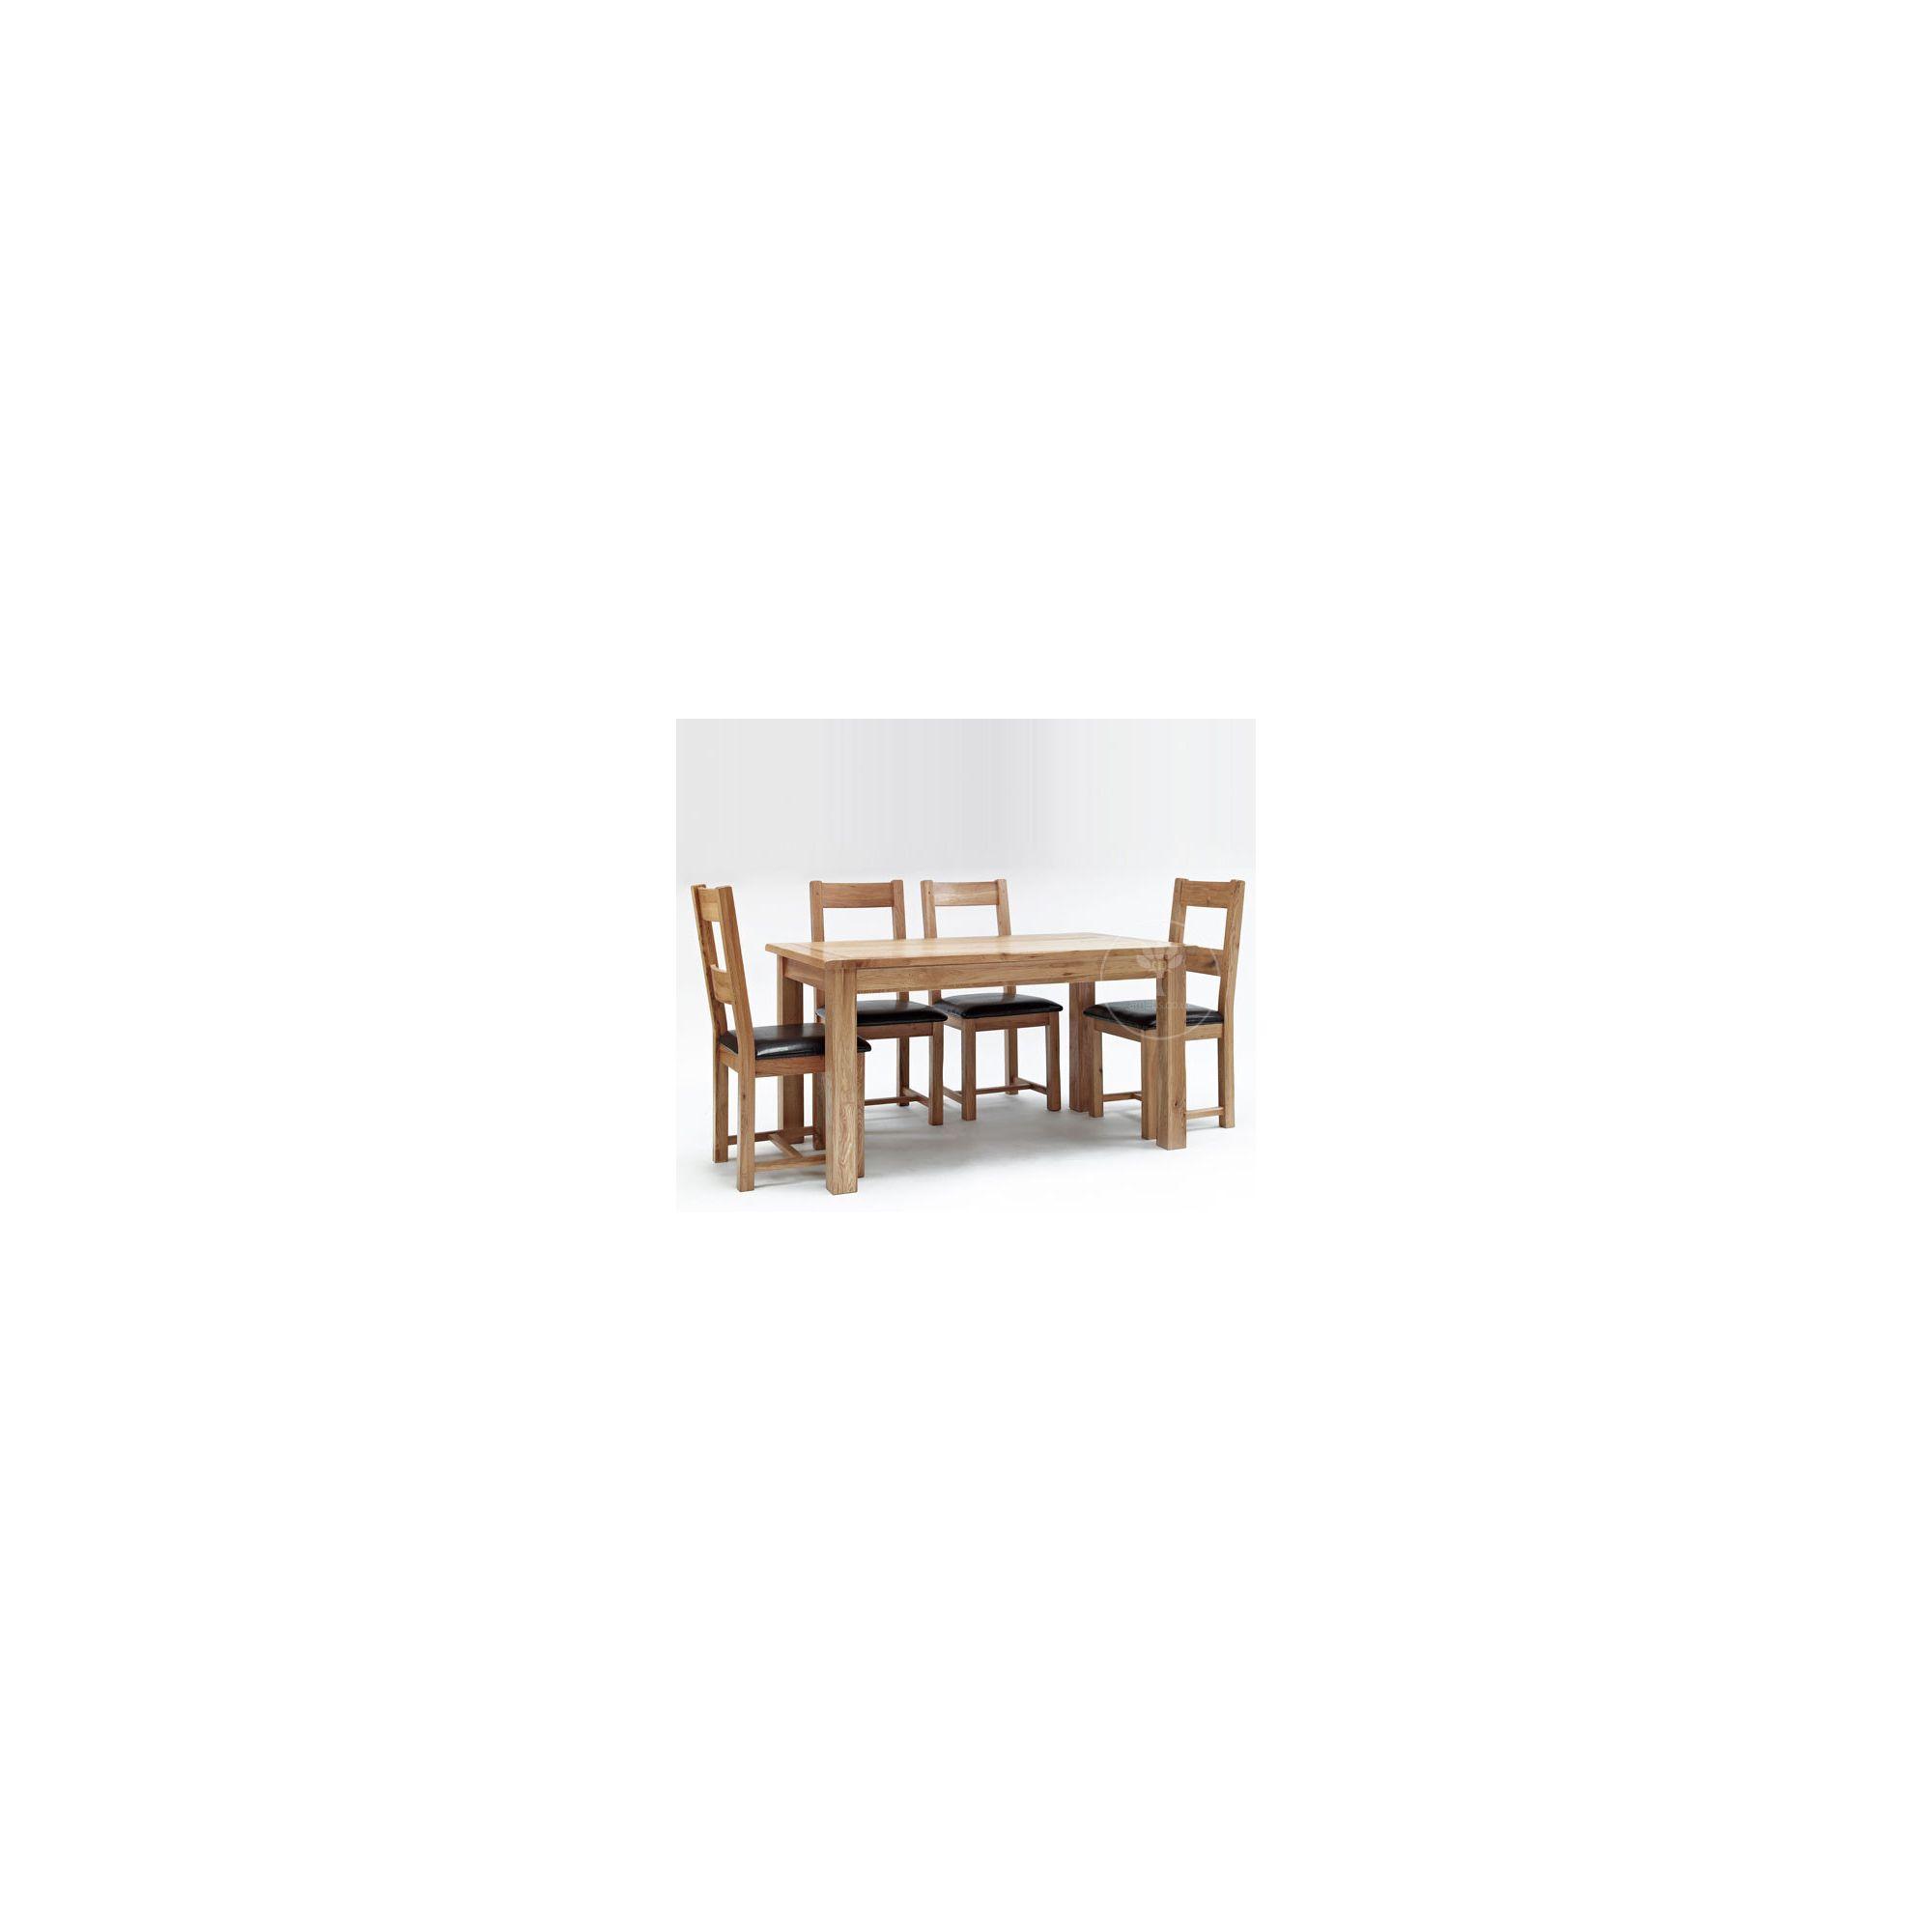 Ametis Westbury Reclaimed Oak 5 Piece Timber Dining Set at Tesco Direct